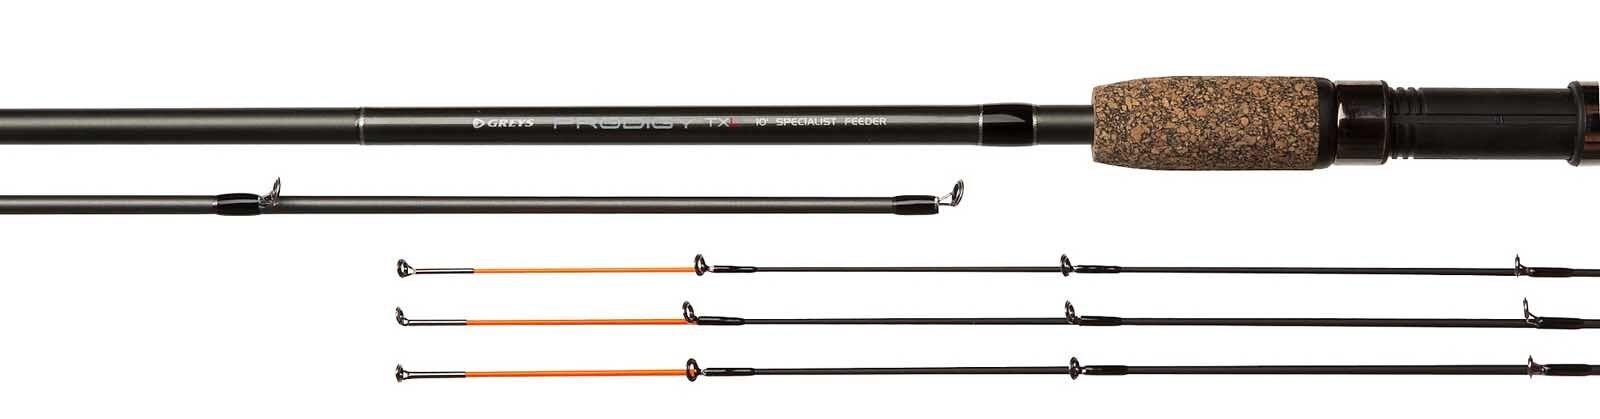 Greys Coarse 10ft 11ft 12ft Fishing Prodigy  TXL SL Feeder Fishing Rod  deals sale